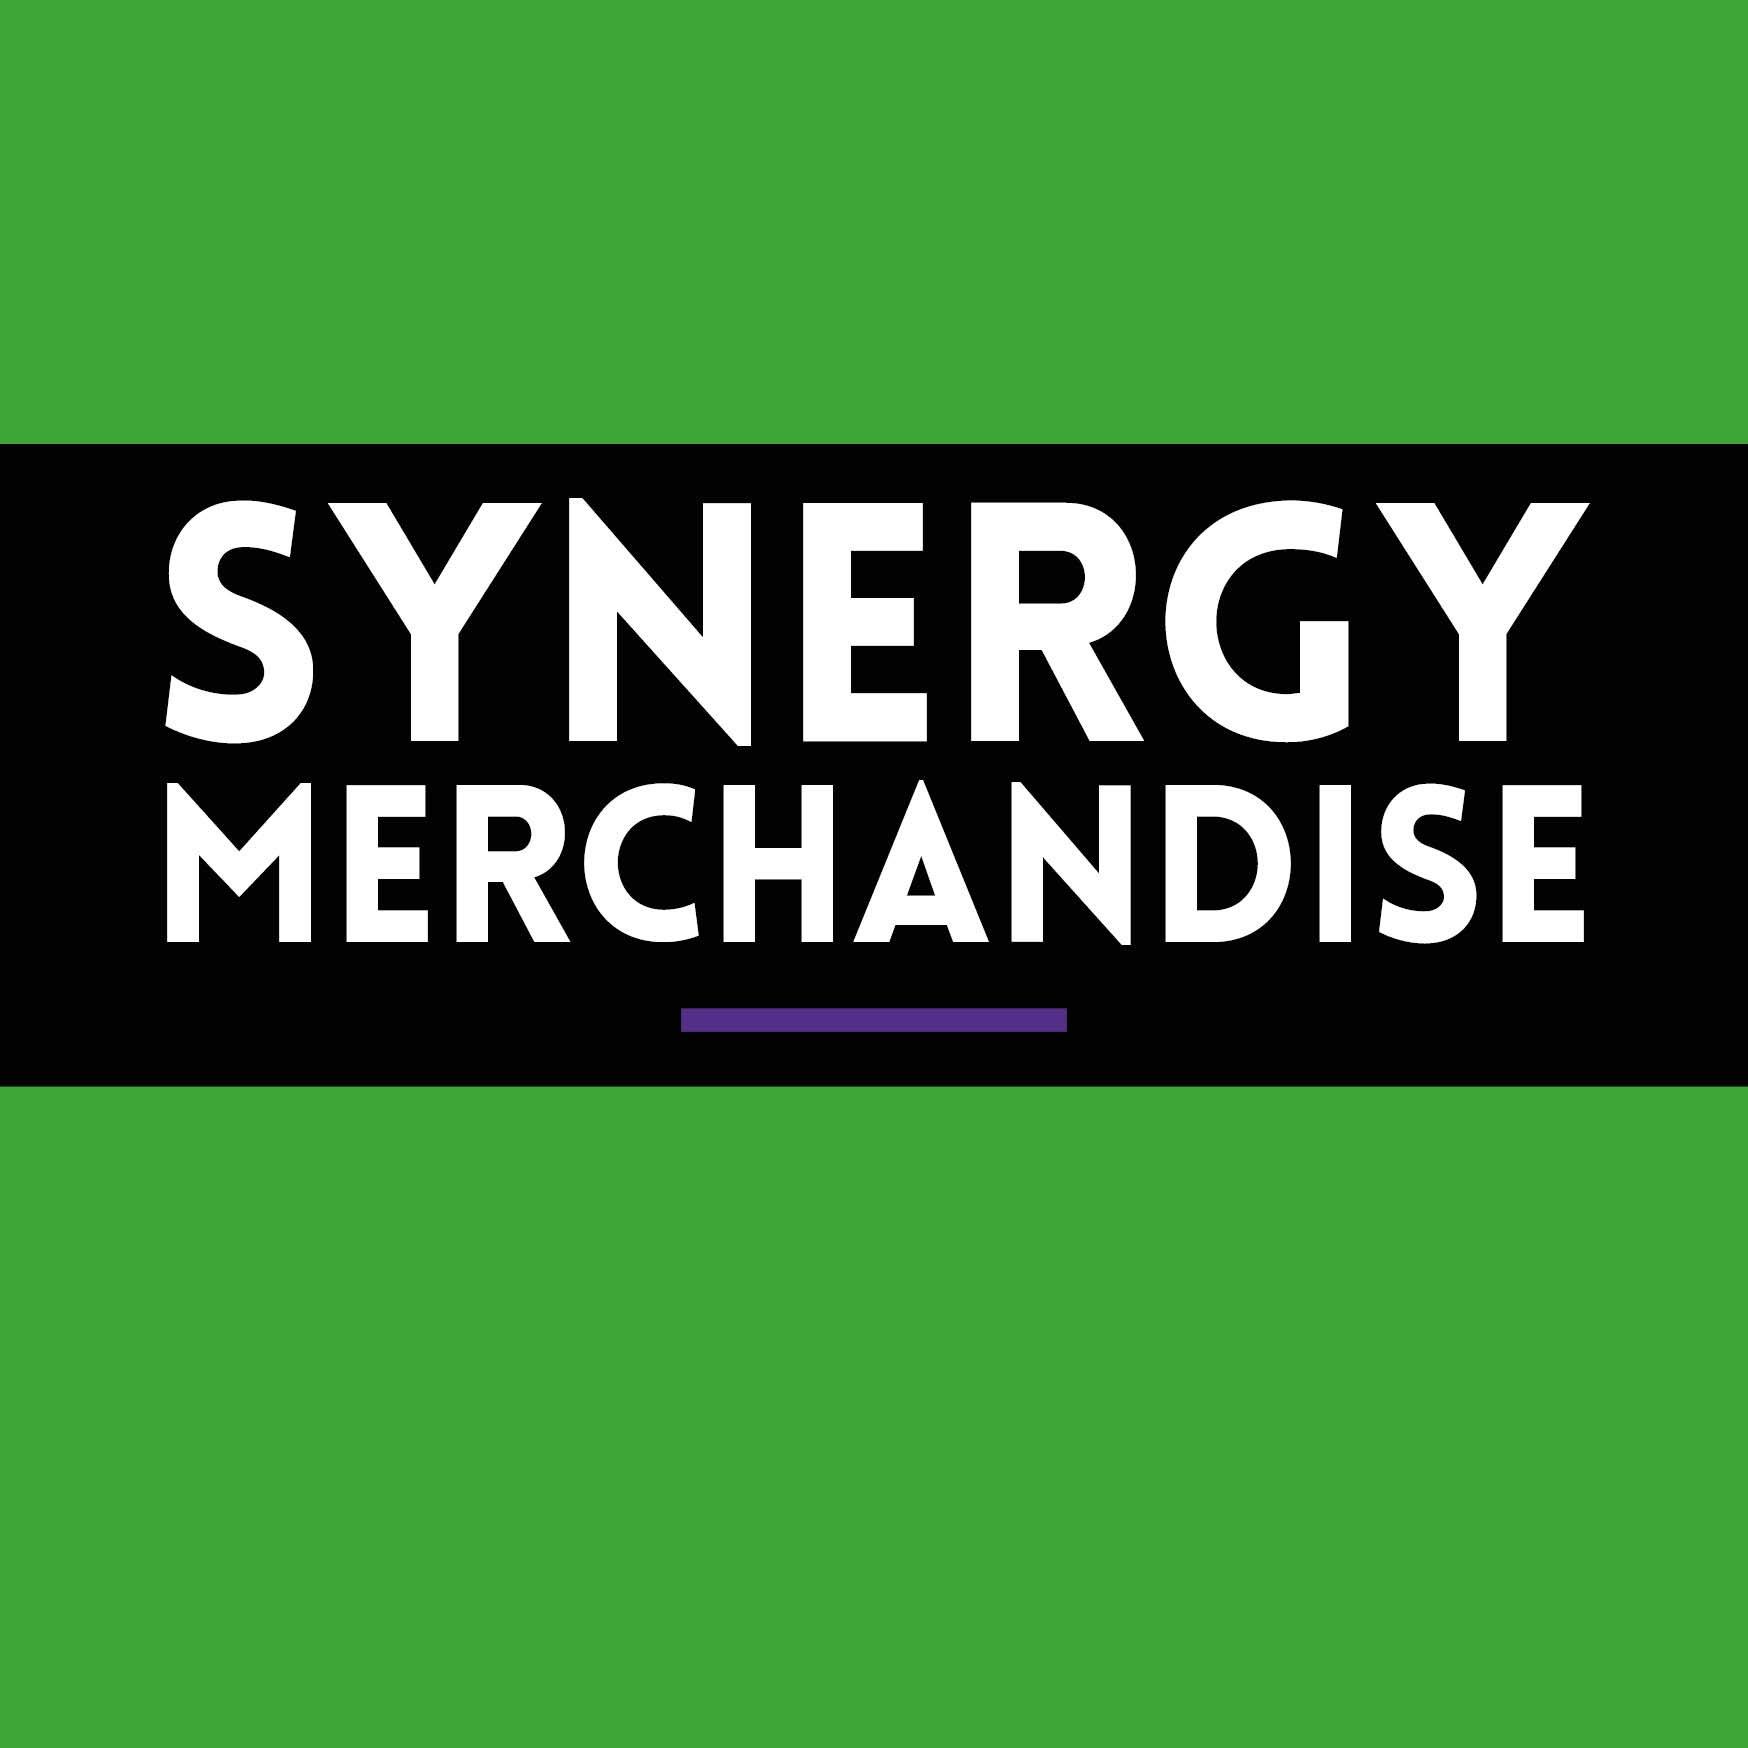 Synergy Merchandise